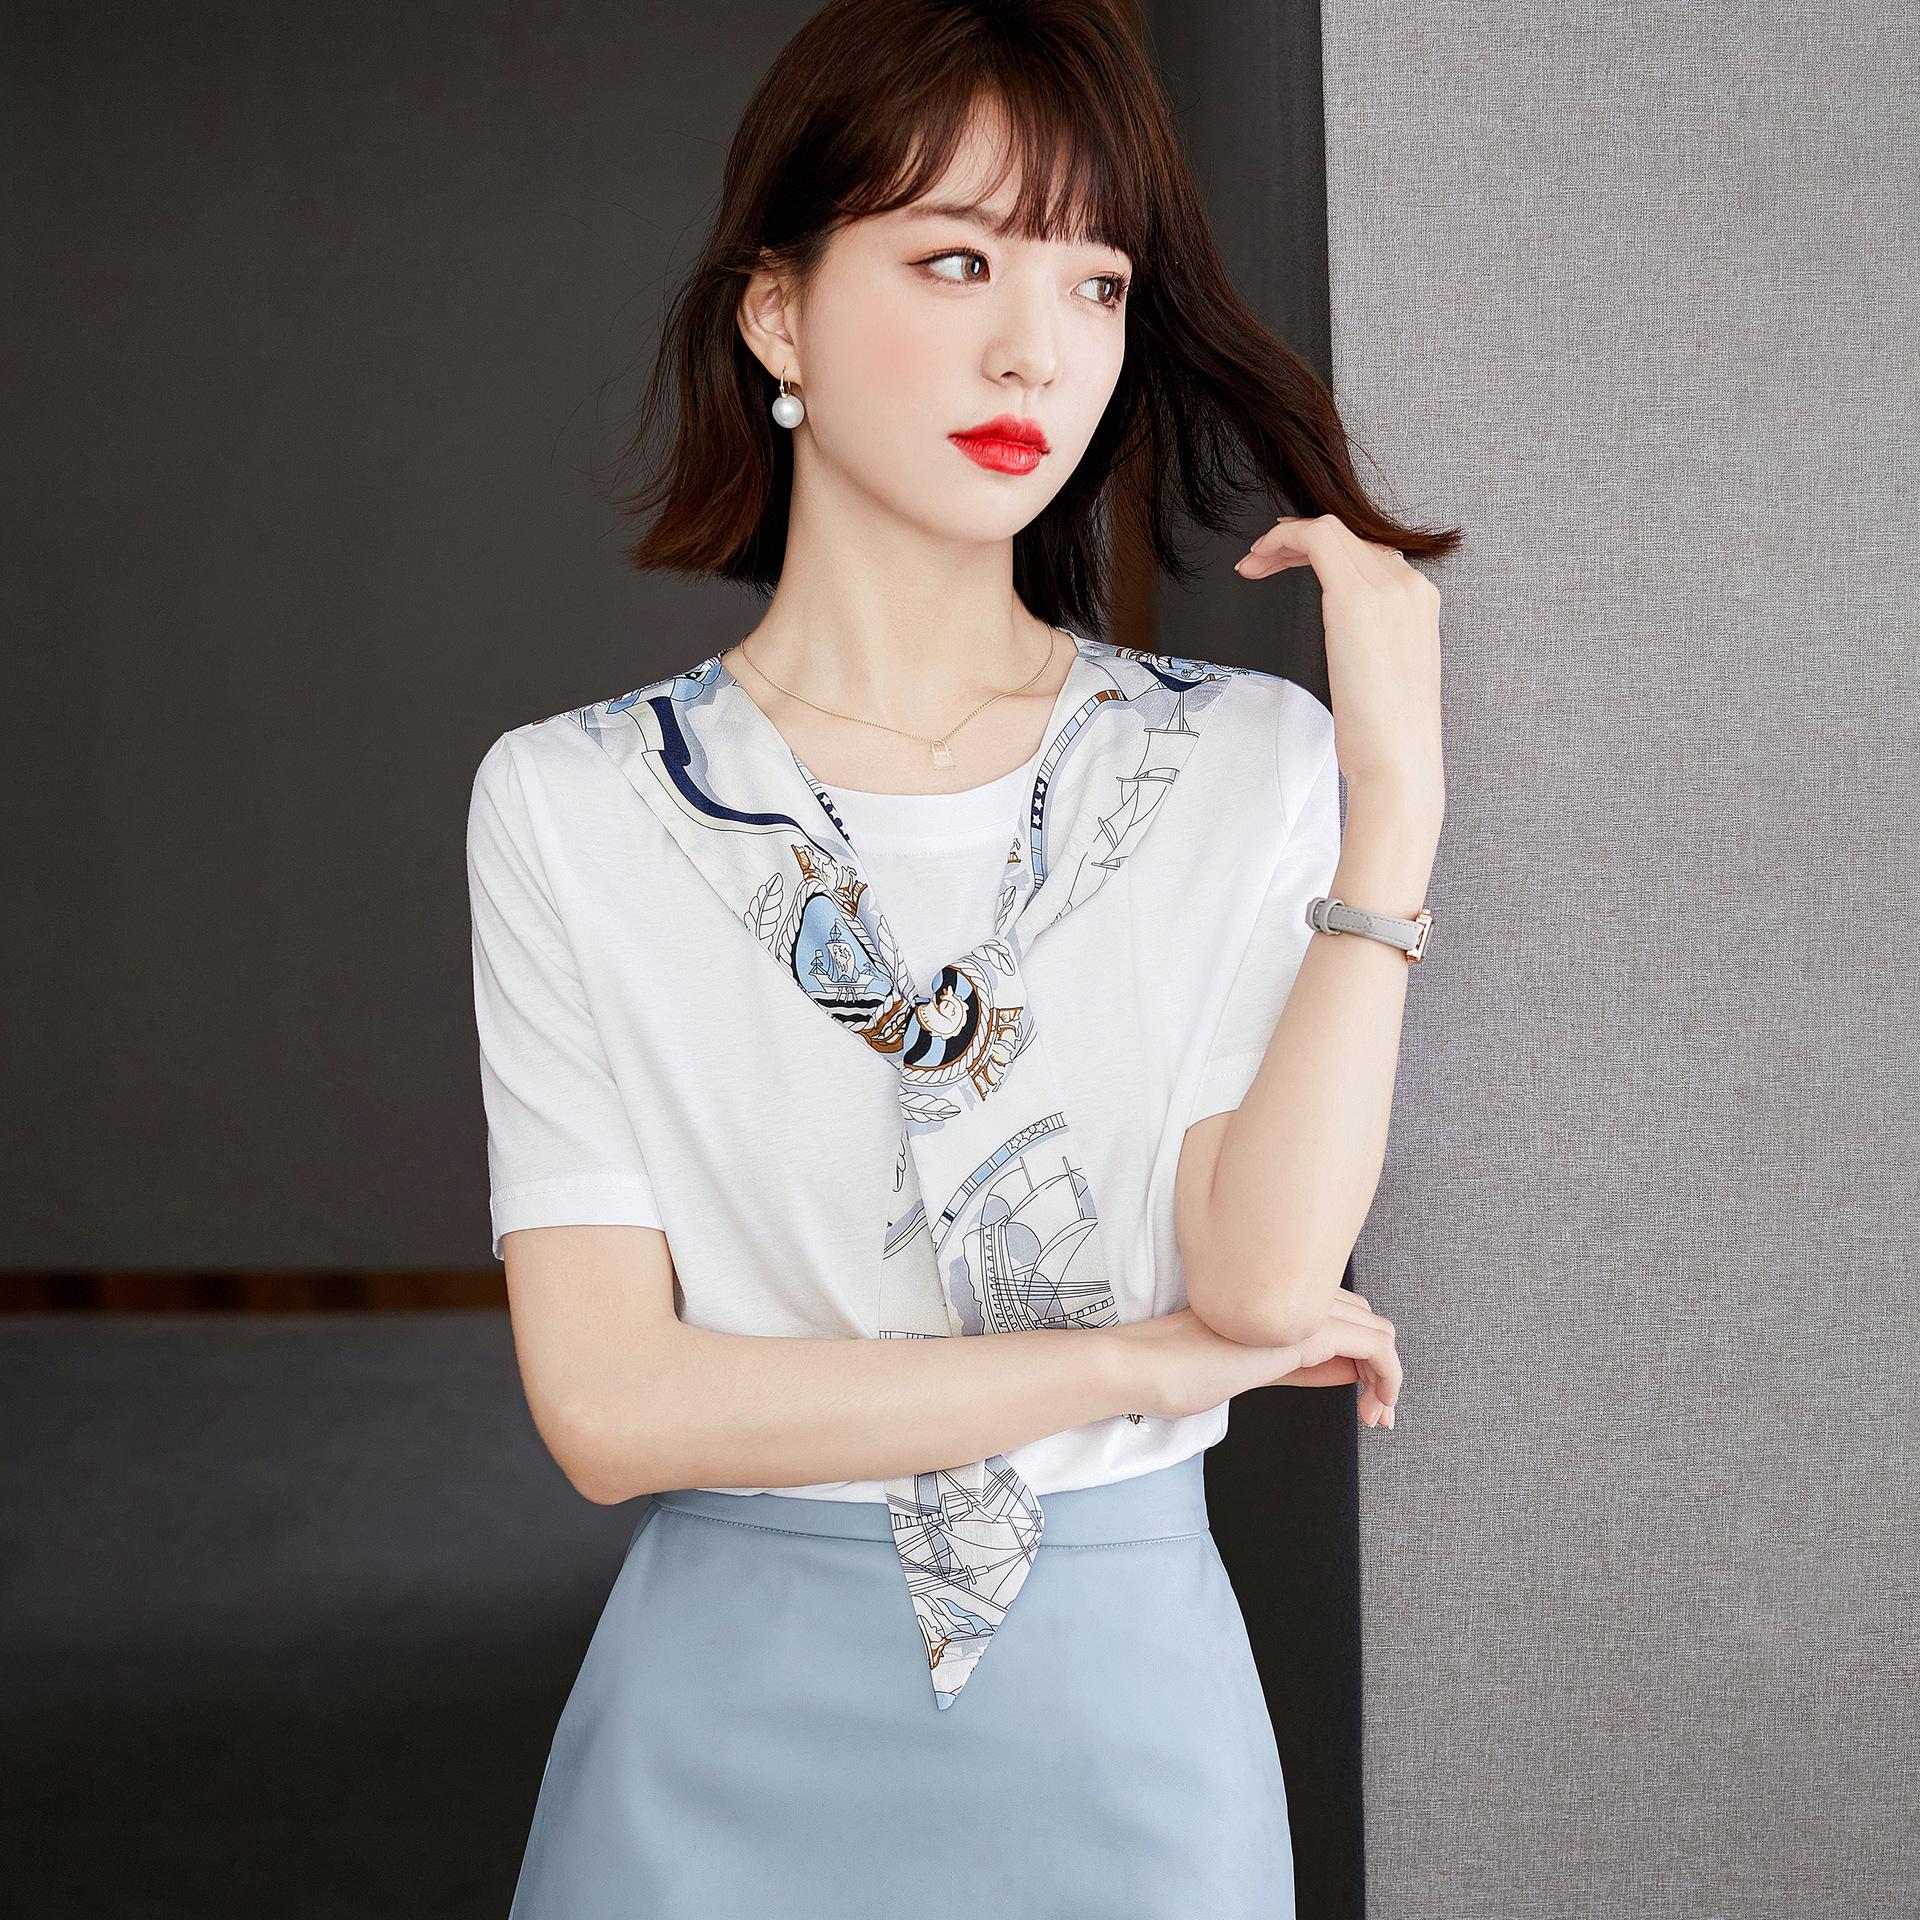 Minimalist Short Sleeve T-Shirt with Silk Scarf for Women